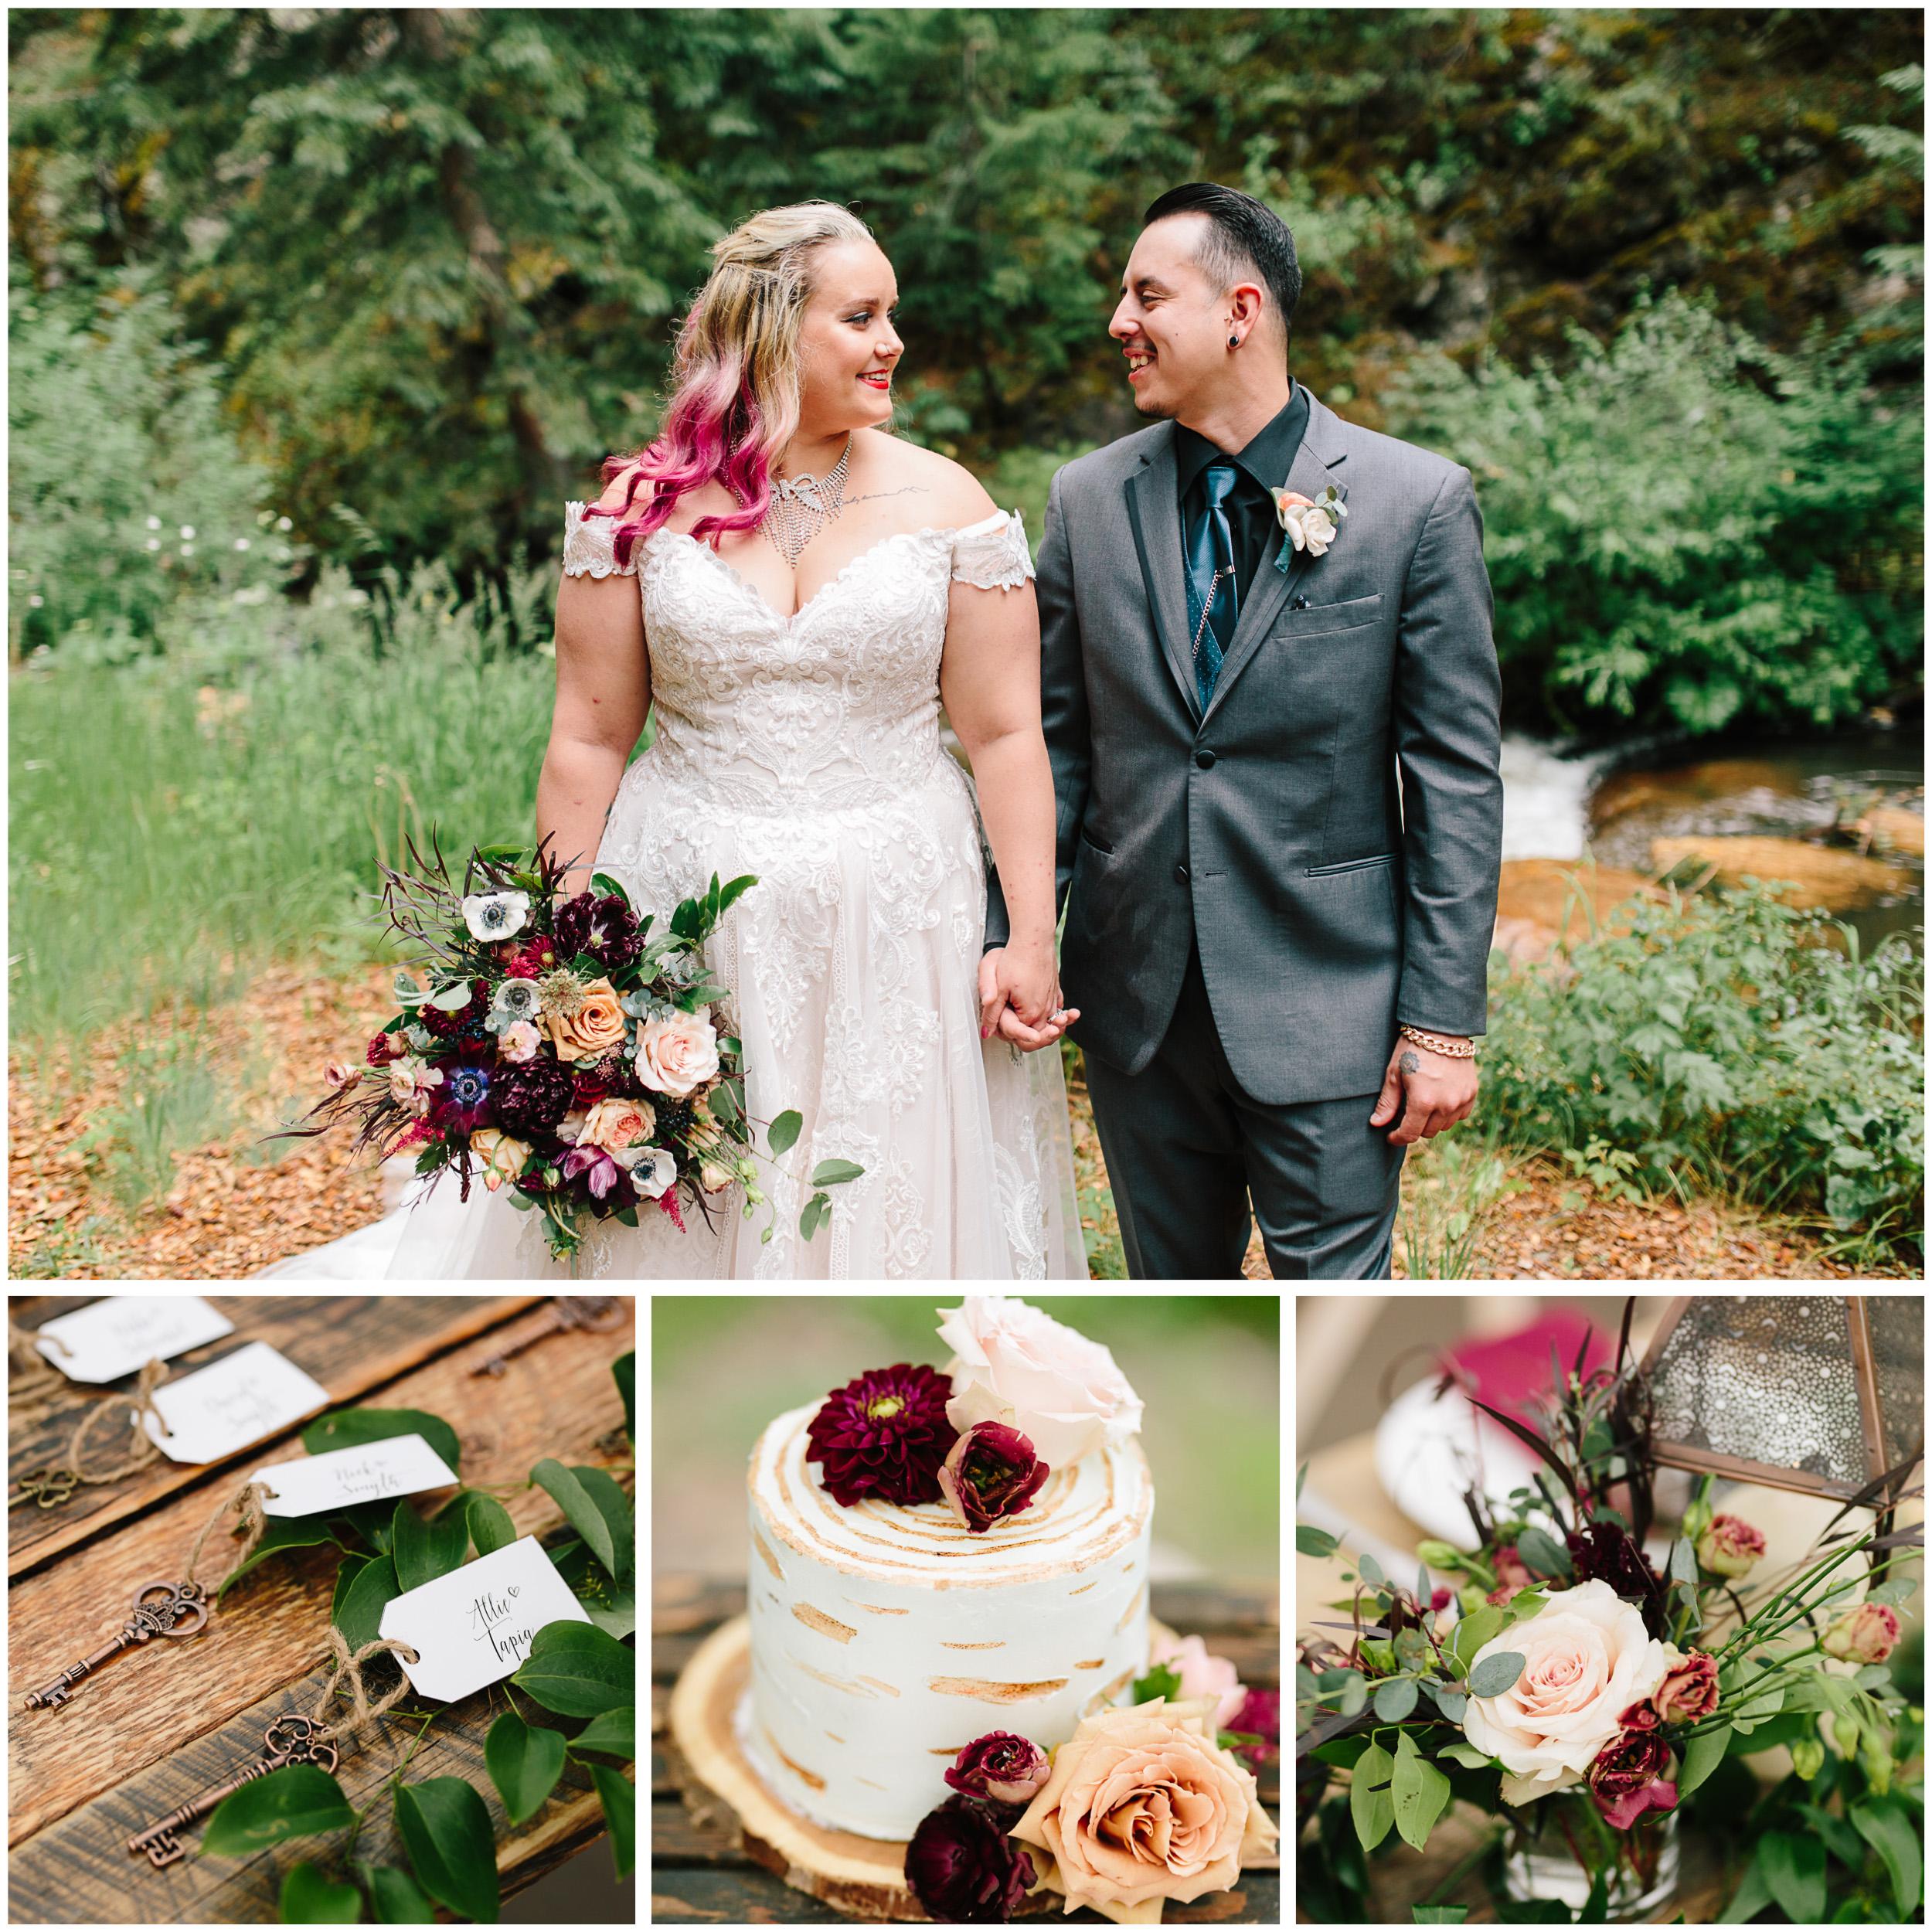 blackstone_rivers_ranch_wedding_header_.jpg